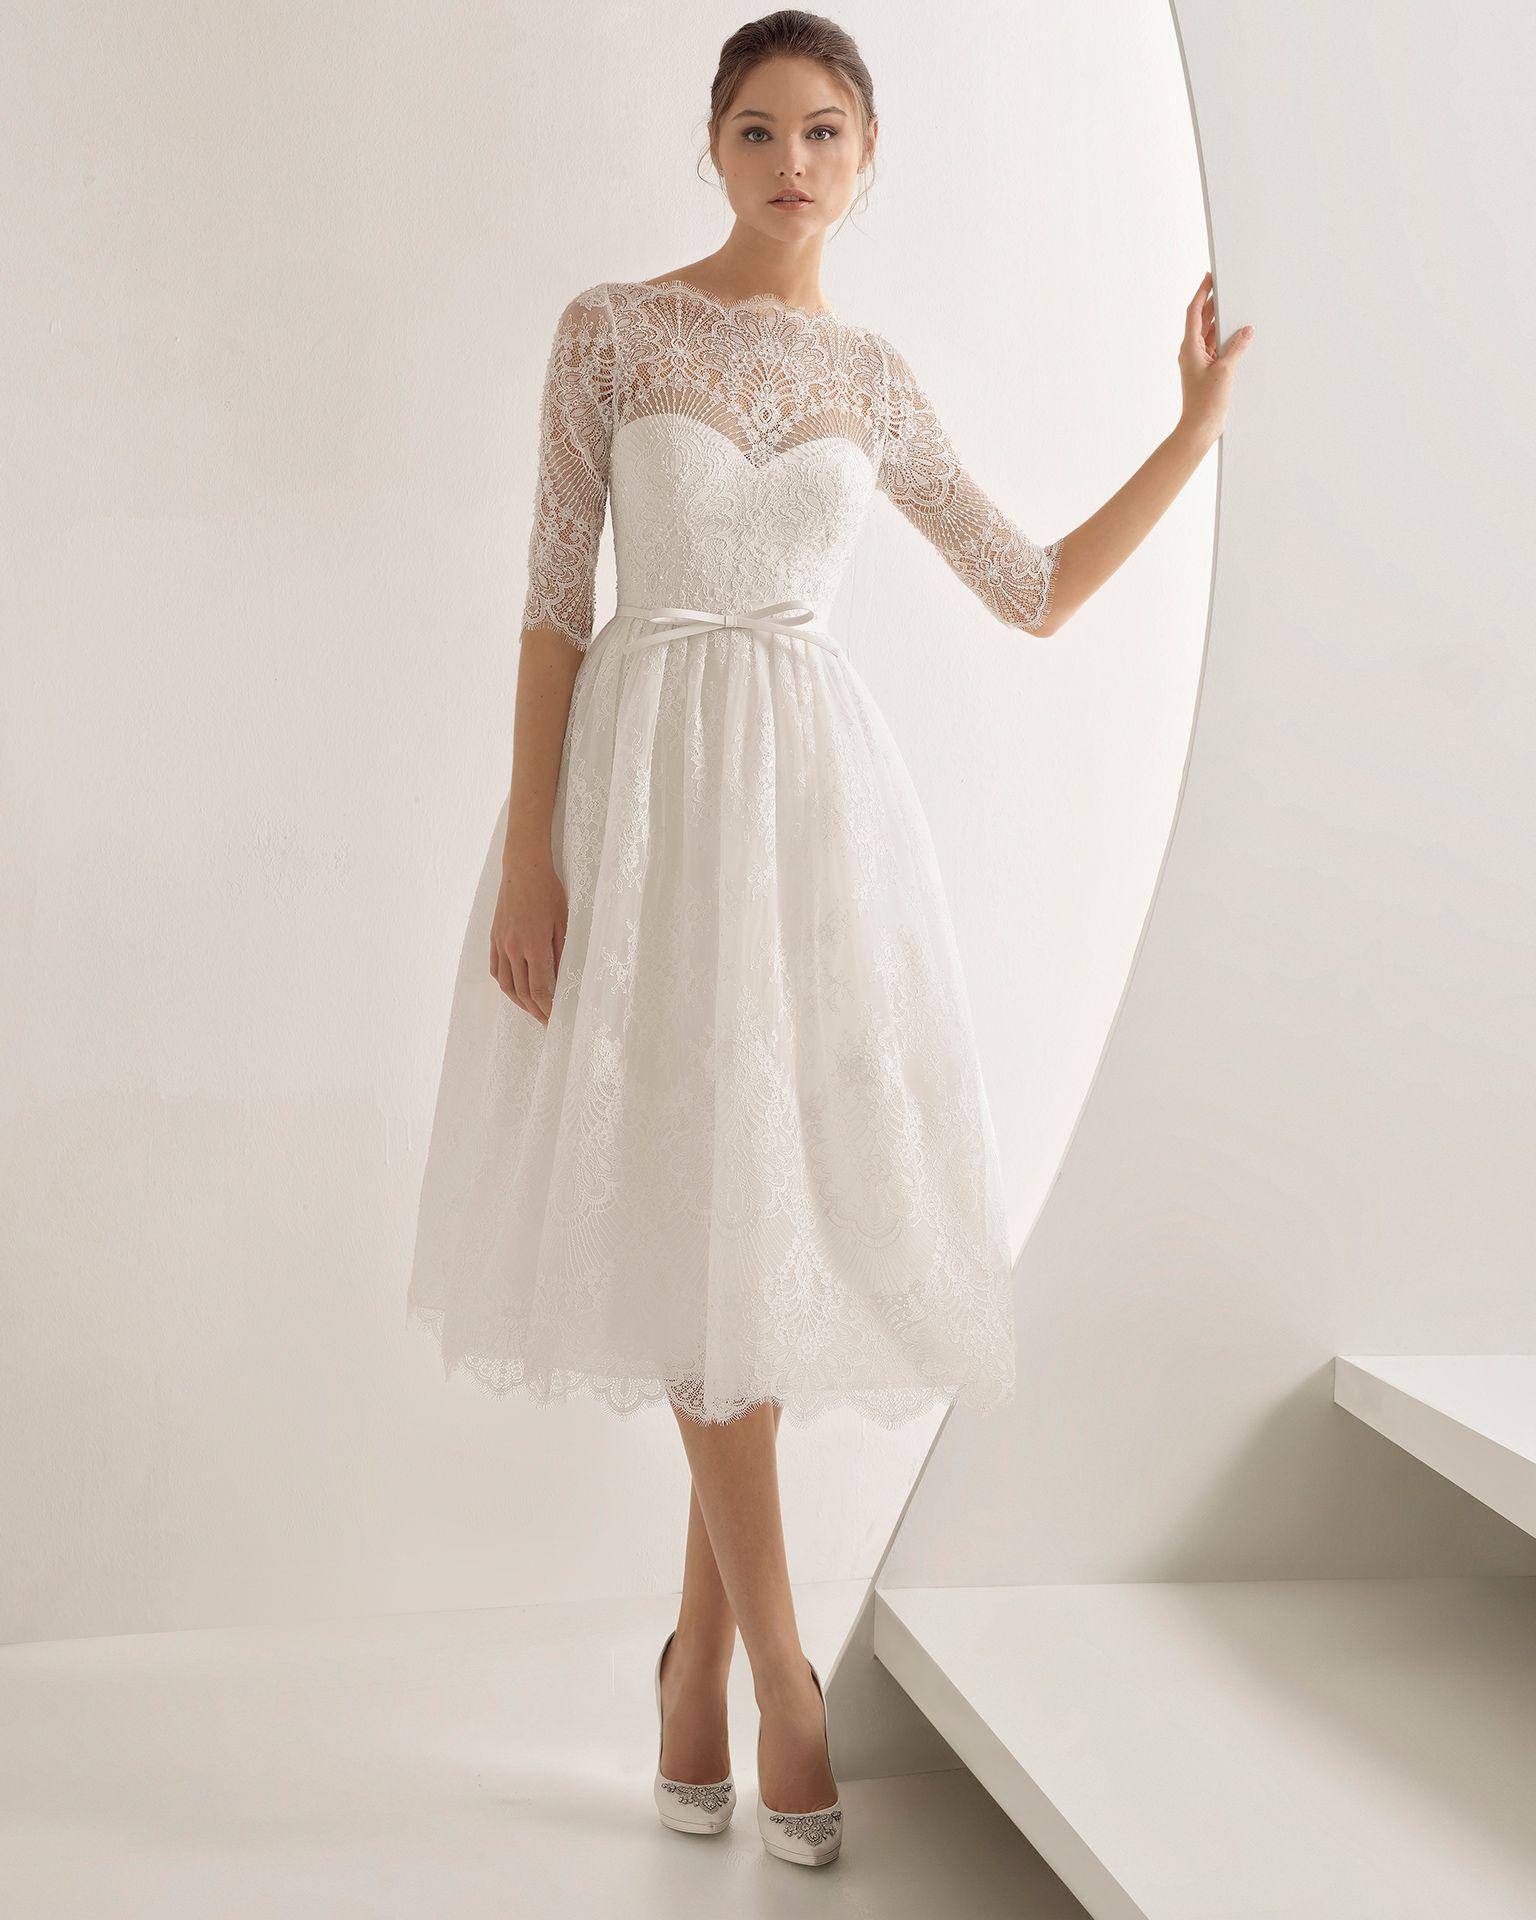 AMALIA - 2018 Bridal Collection. Rosa Clará Collection  aaba0b7c3ee9